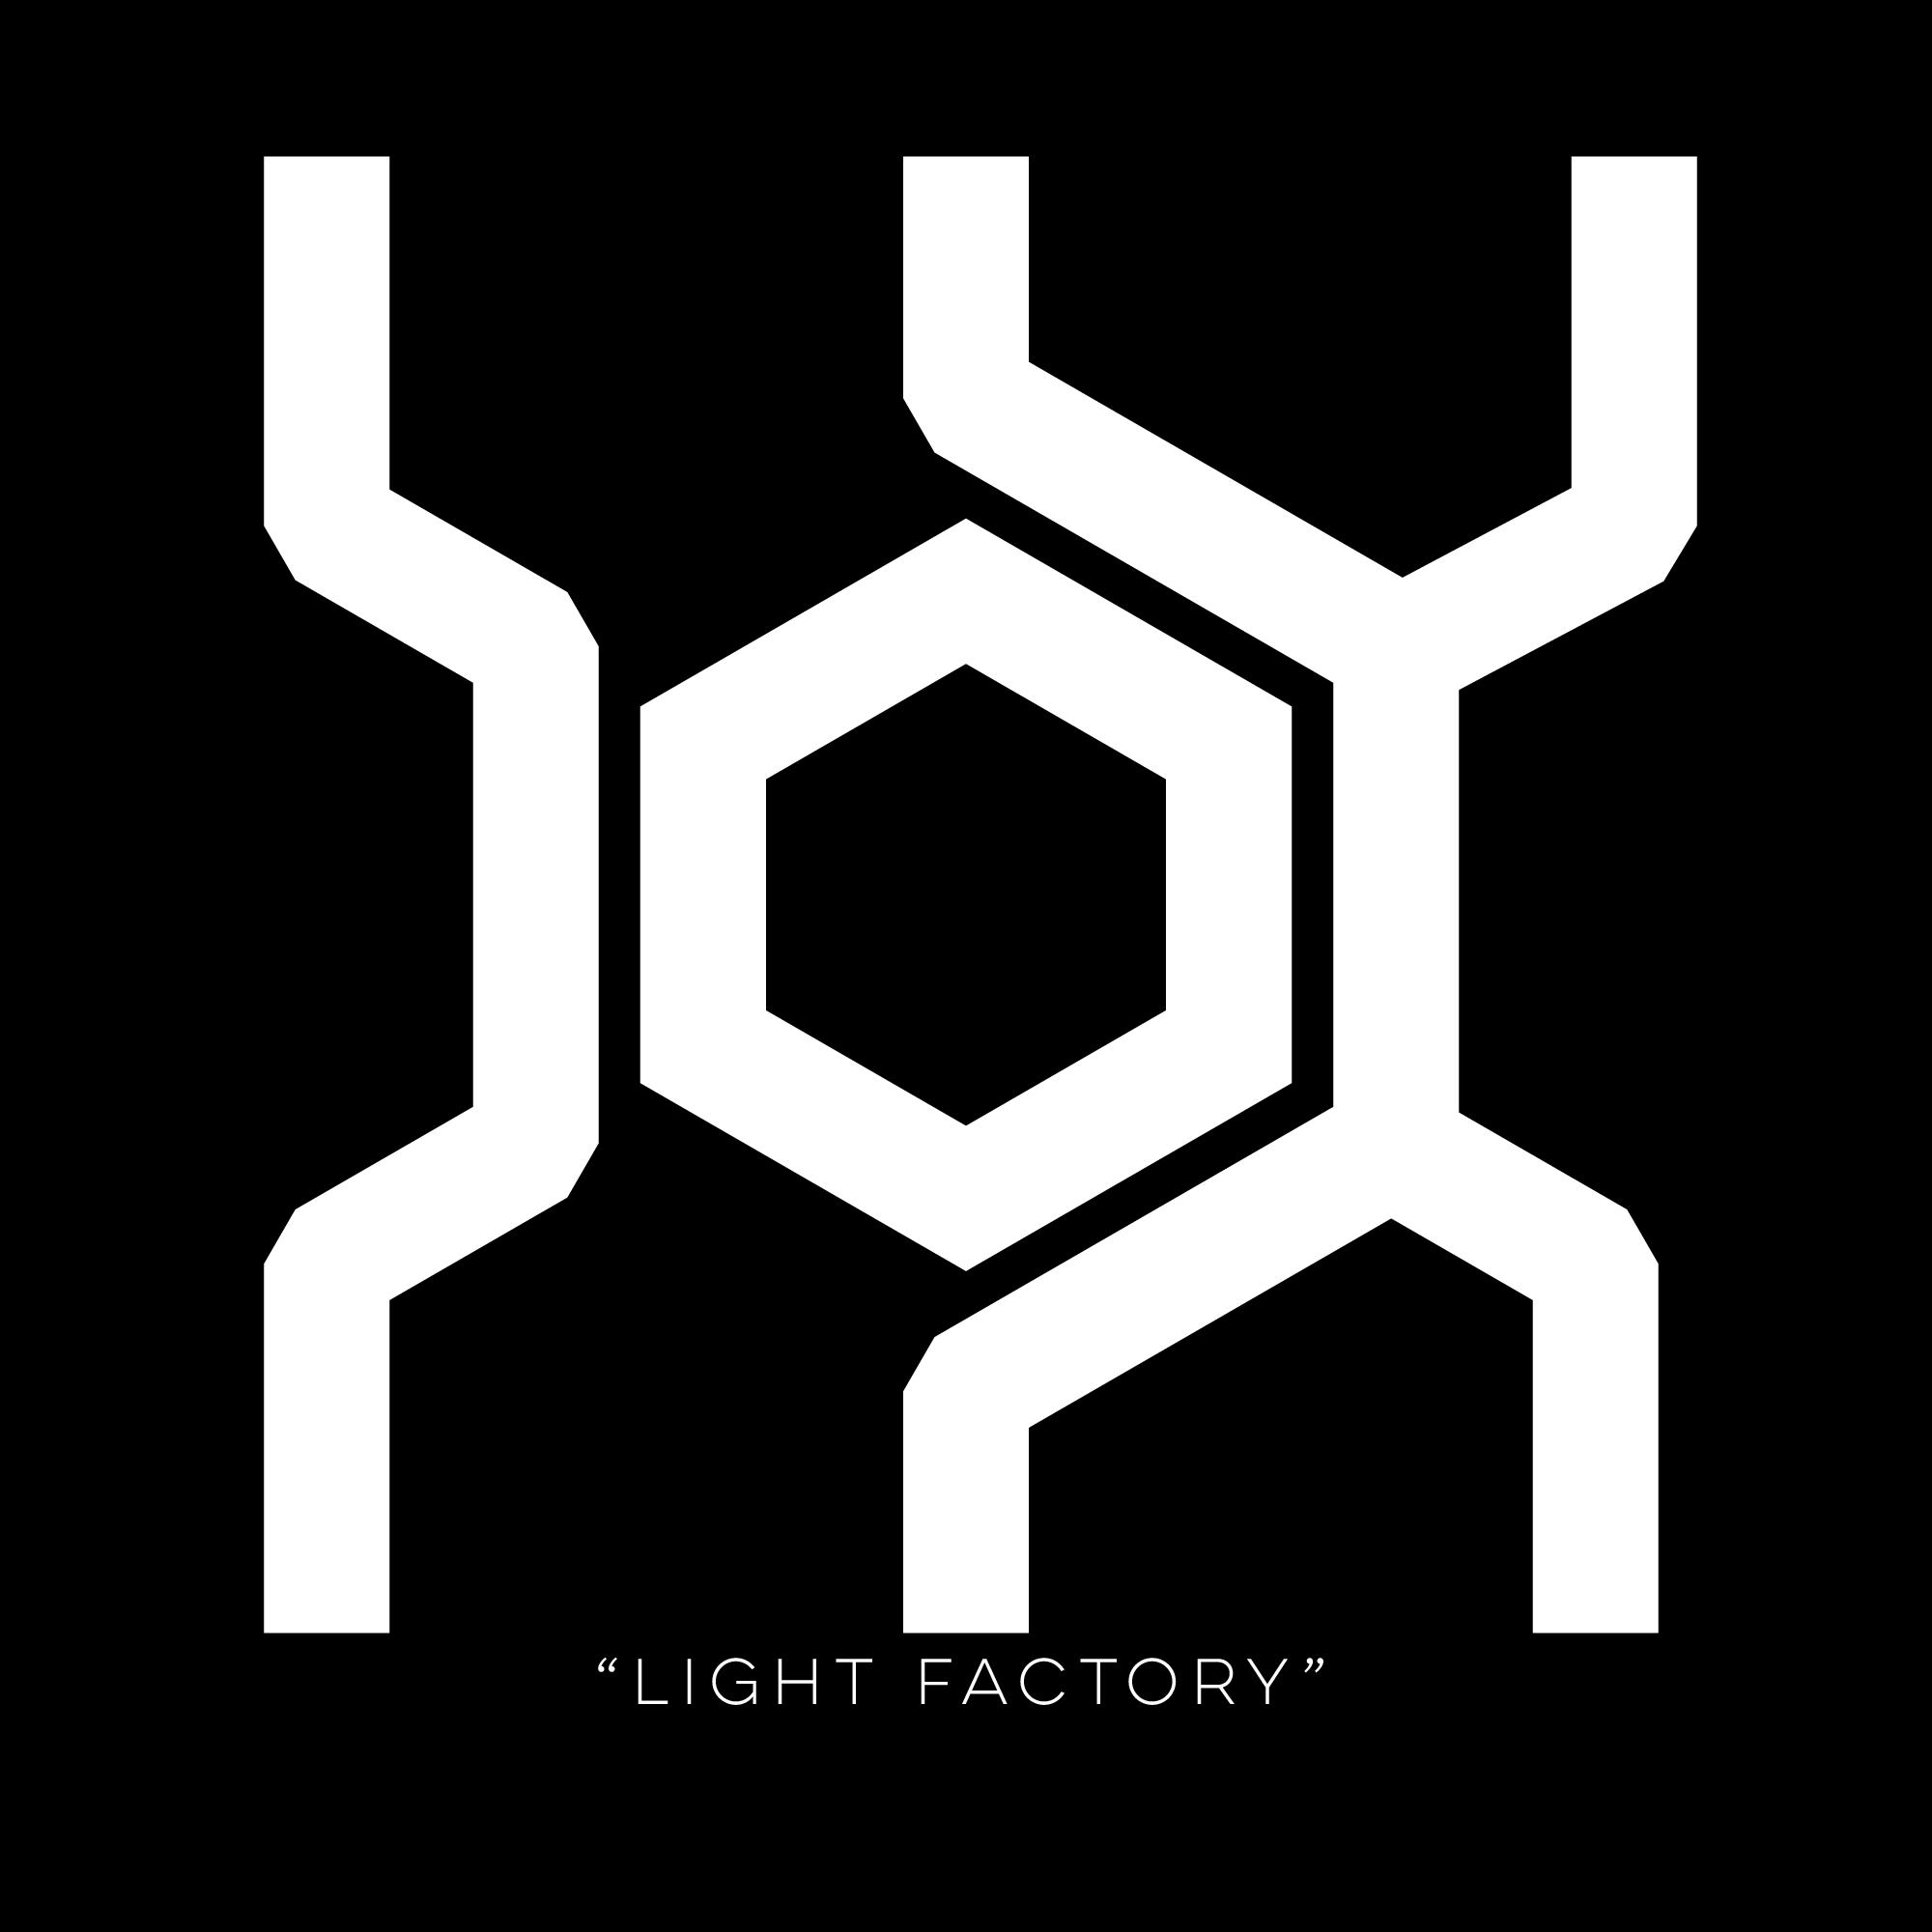 10 LIGHT FACTORY.png